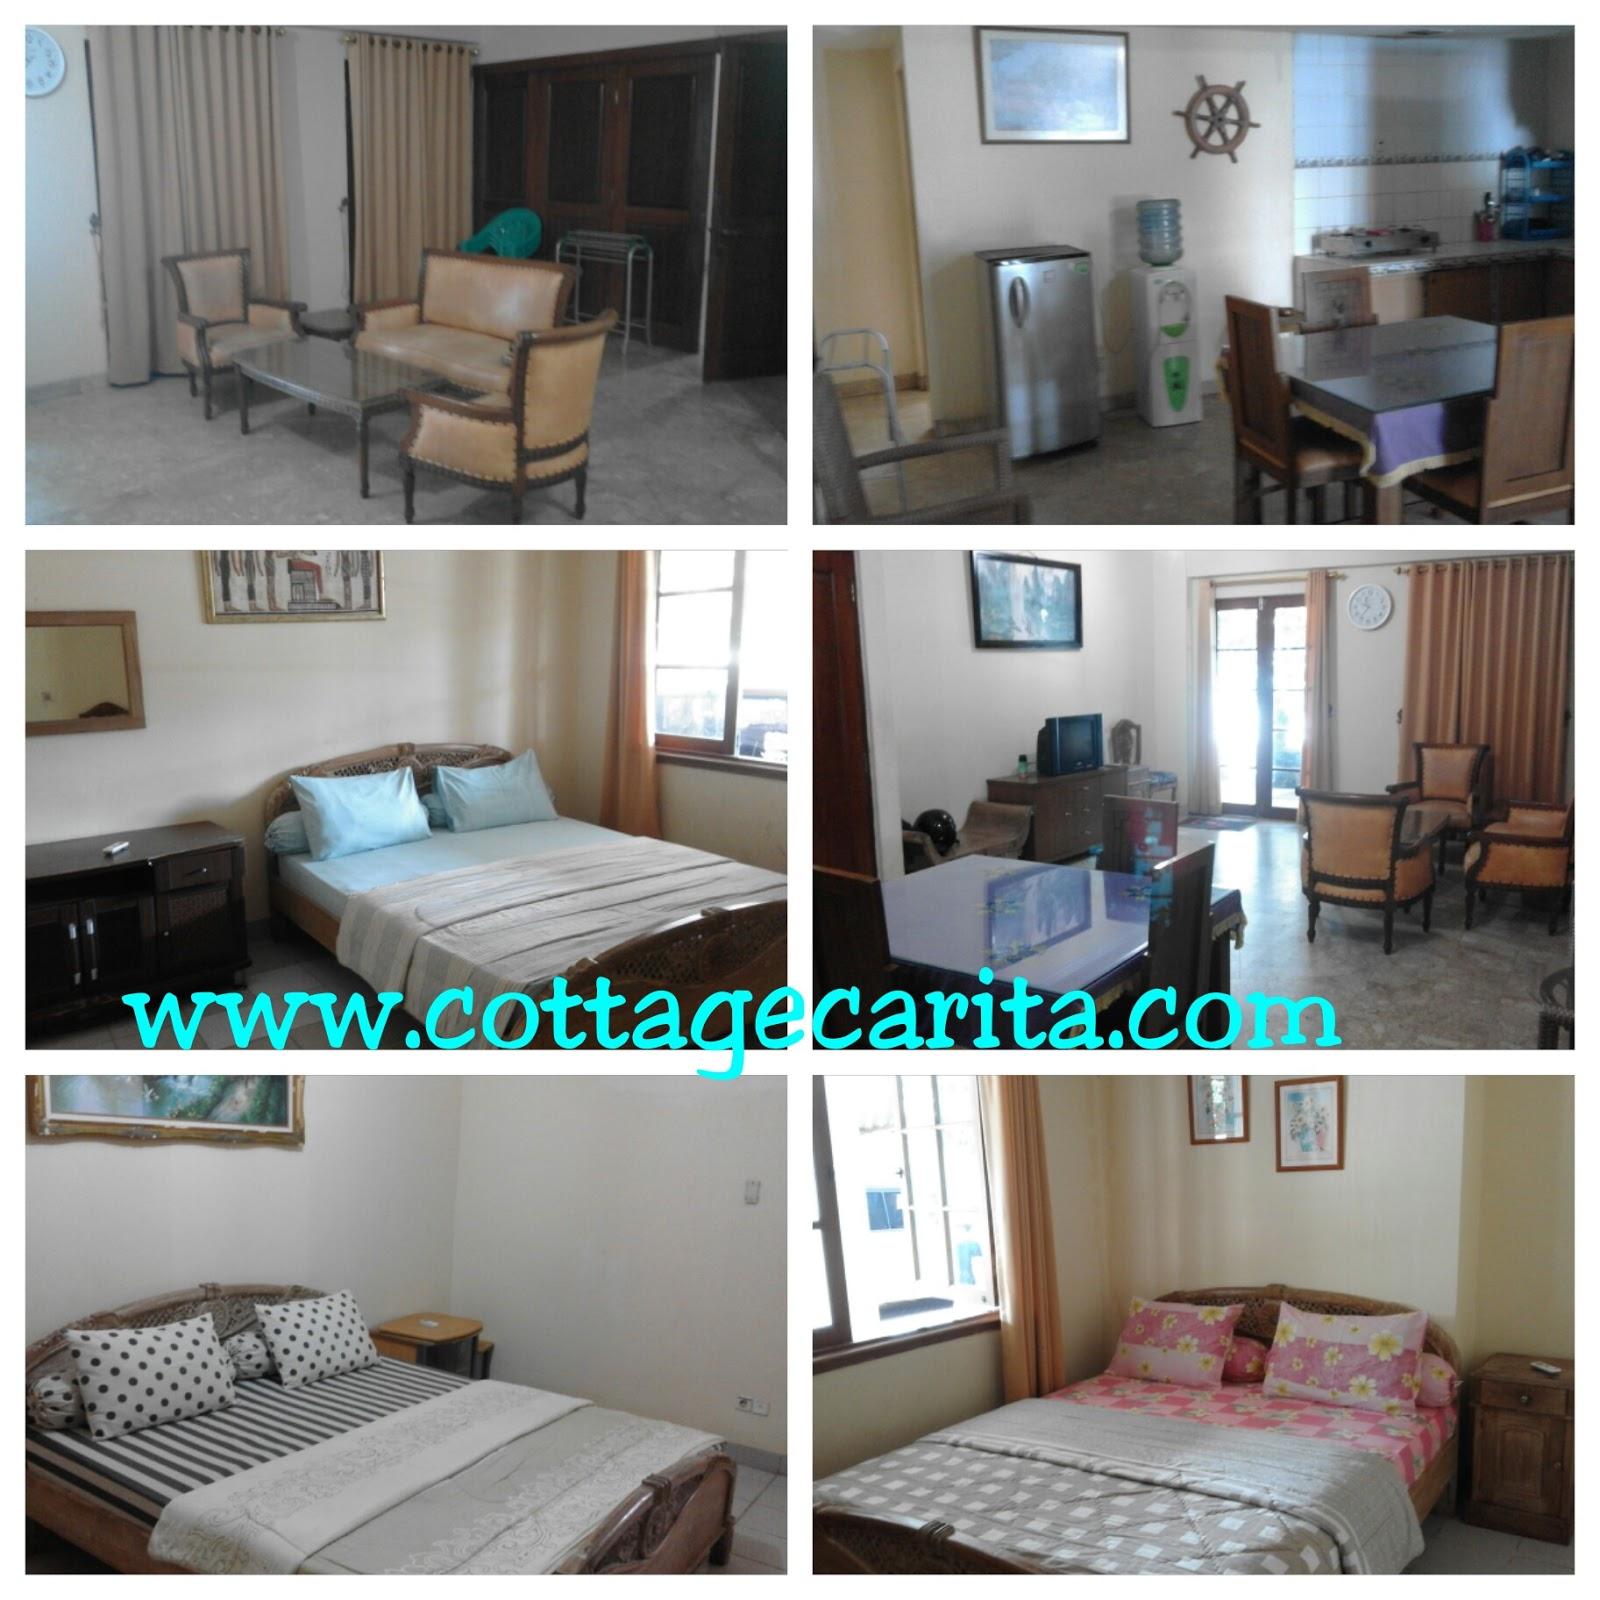 Cottage Carita Kondominium Pantai Hotel Lippo Tertarik Berlibur Langsung Aja